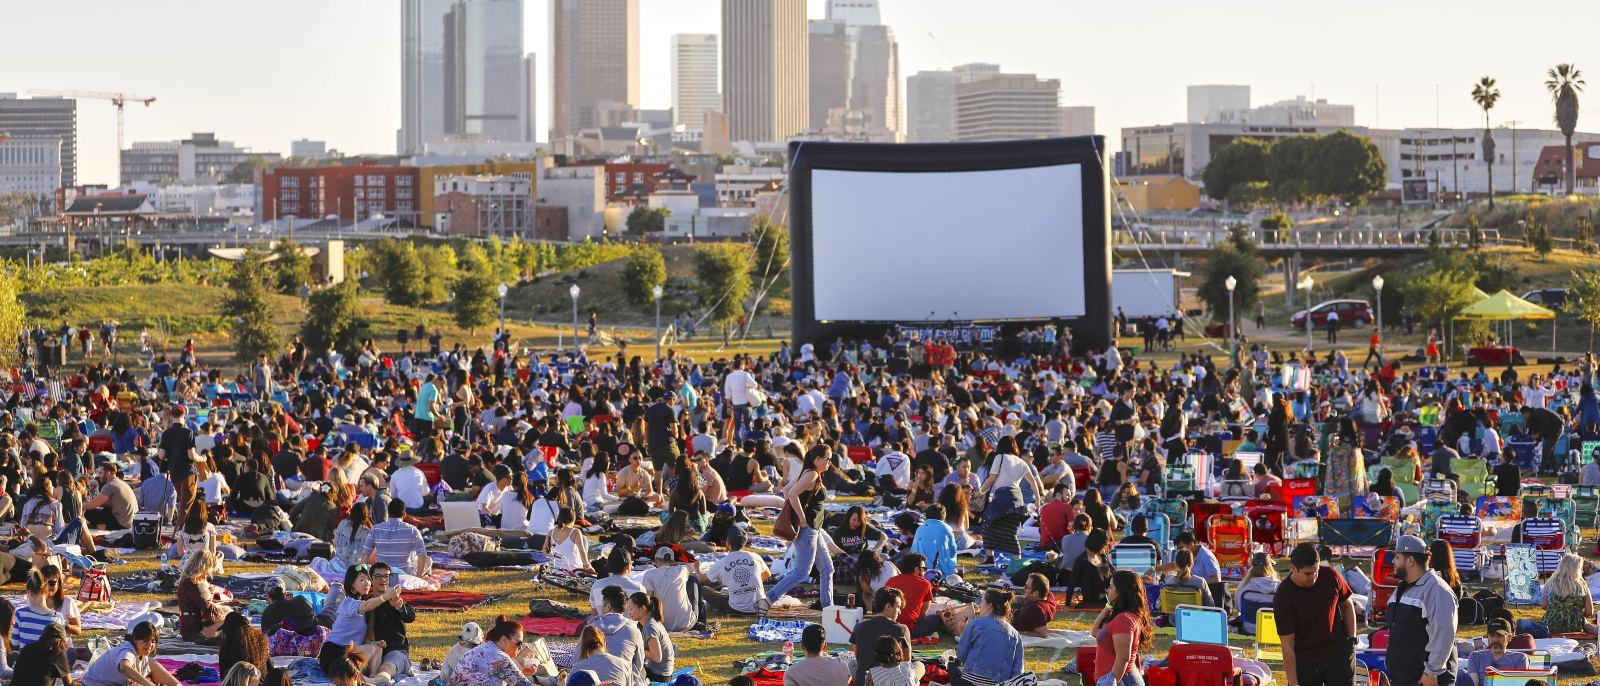 Street Food Cinema at Los Angeles State Historic Park